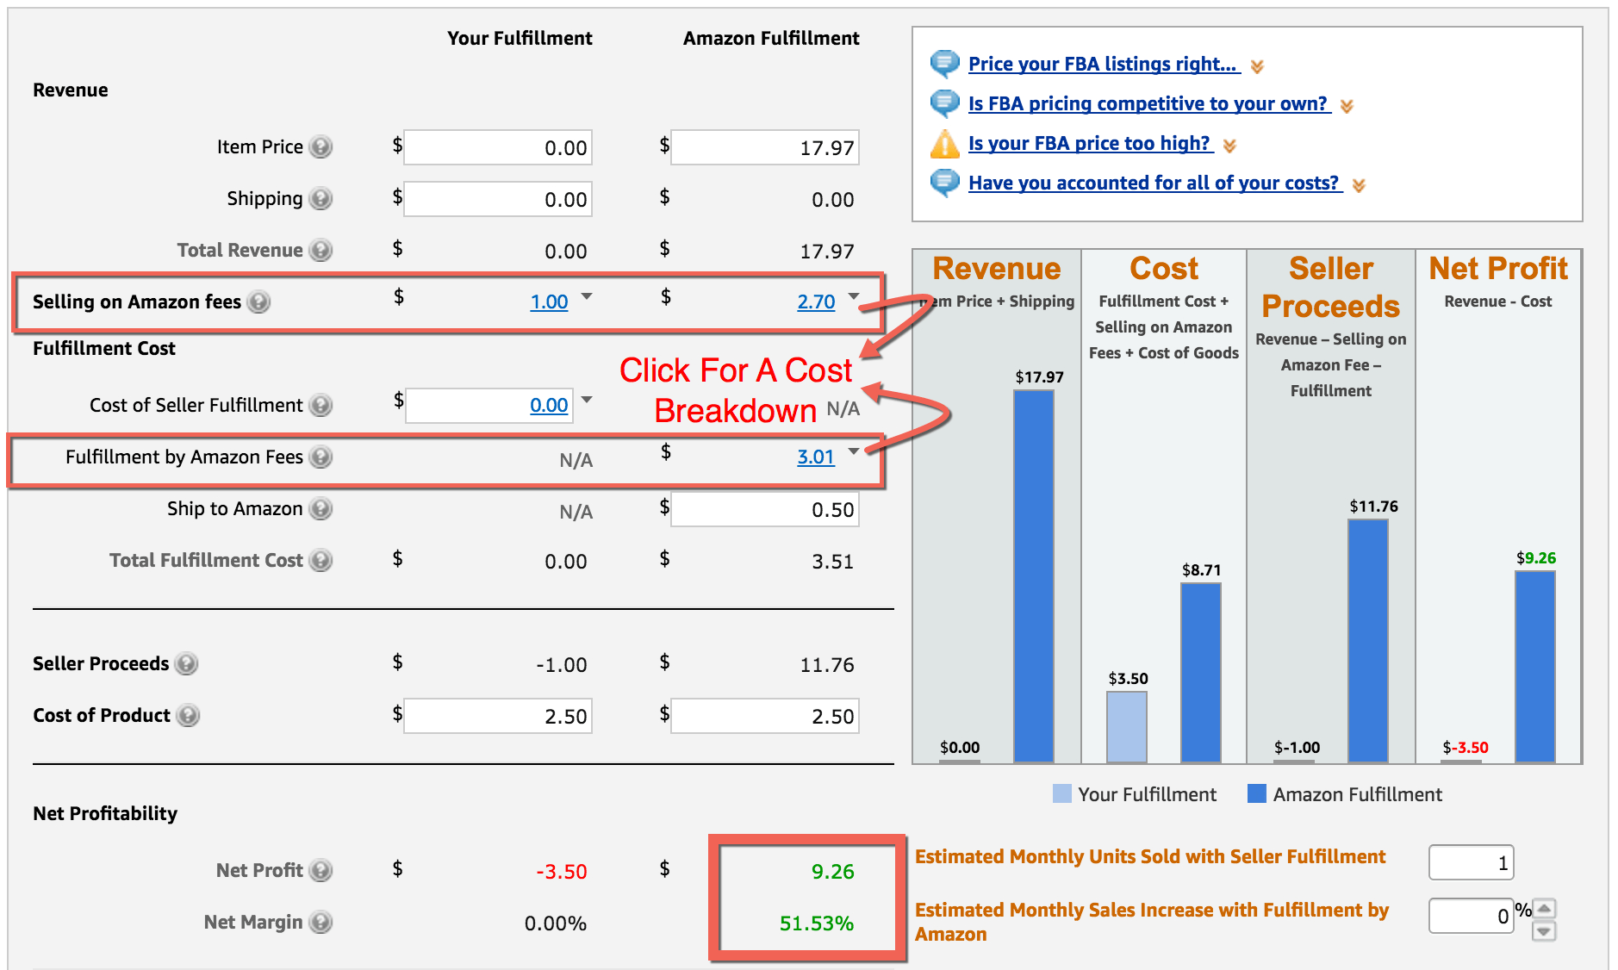 Gp Calculator Spreadsheet Throughout Fba Calculator: Free Tool To Calculate Amazon Fees, Profit  Revenue